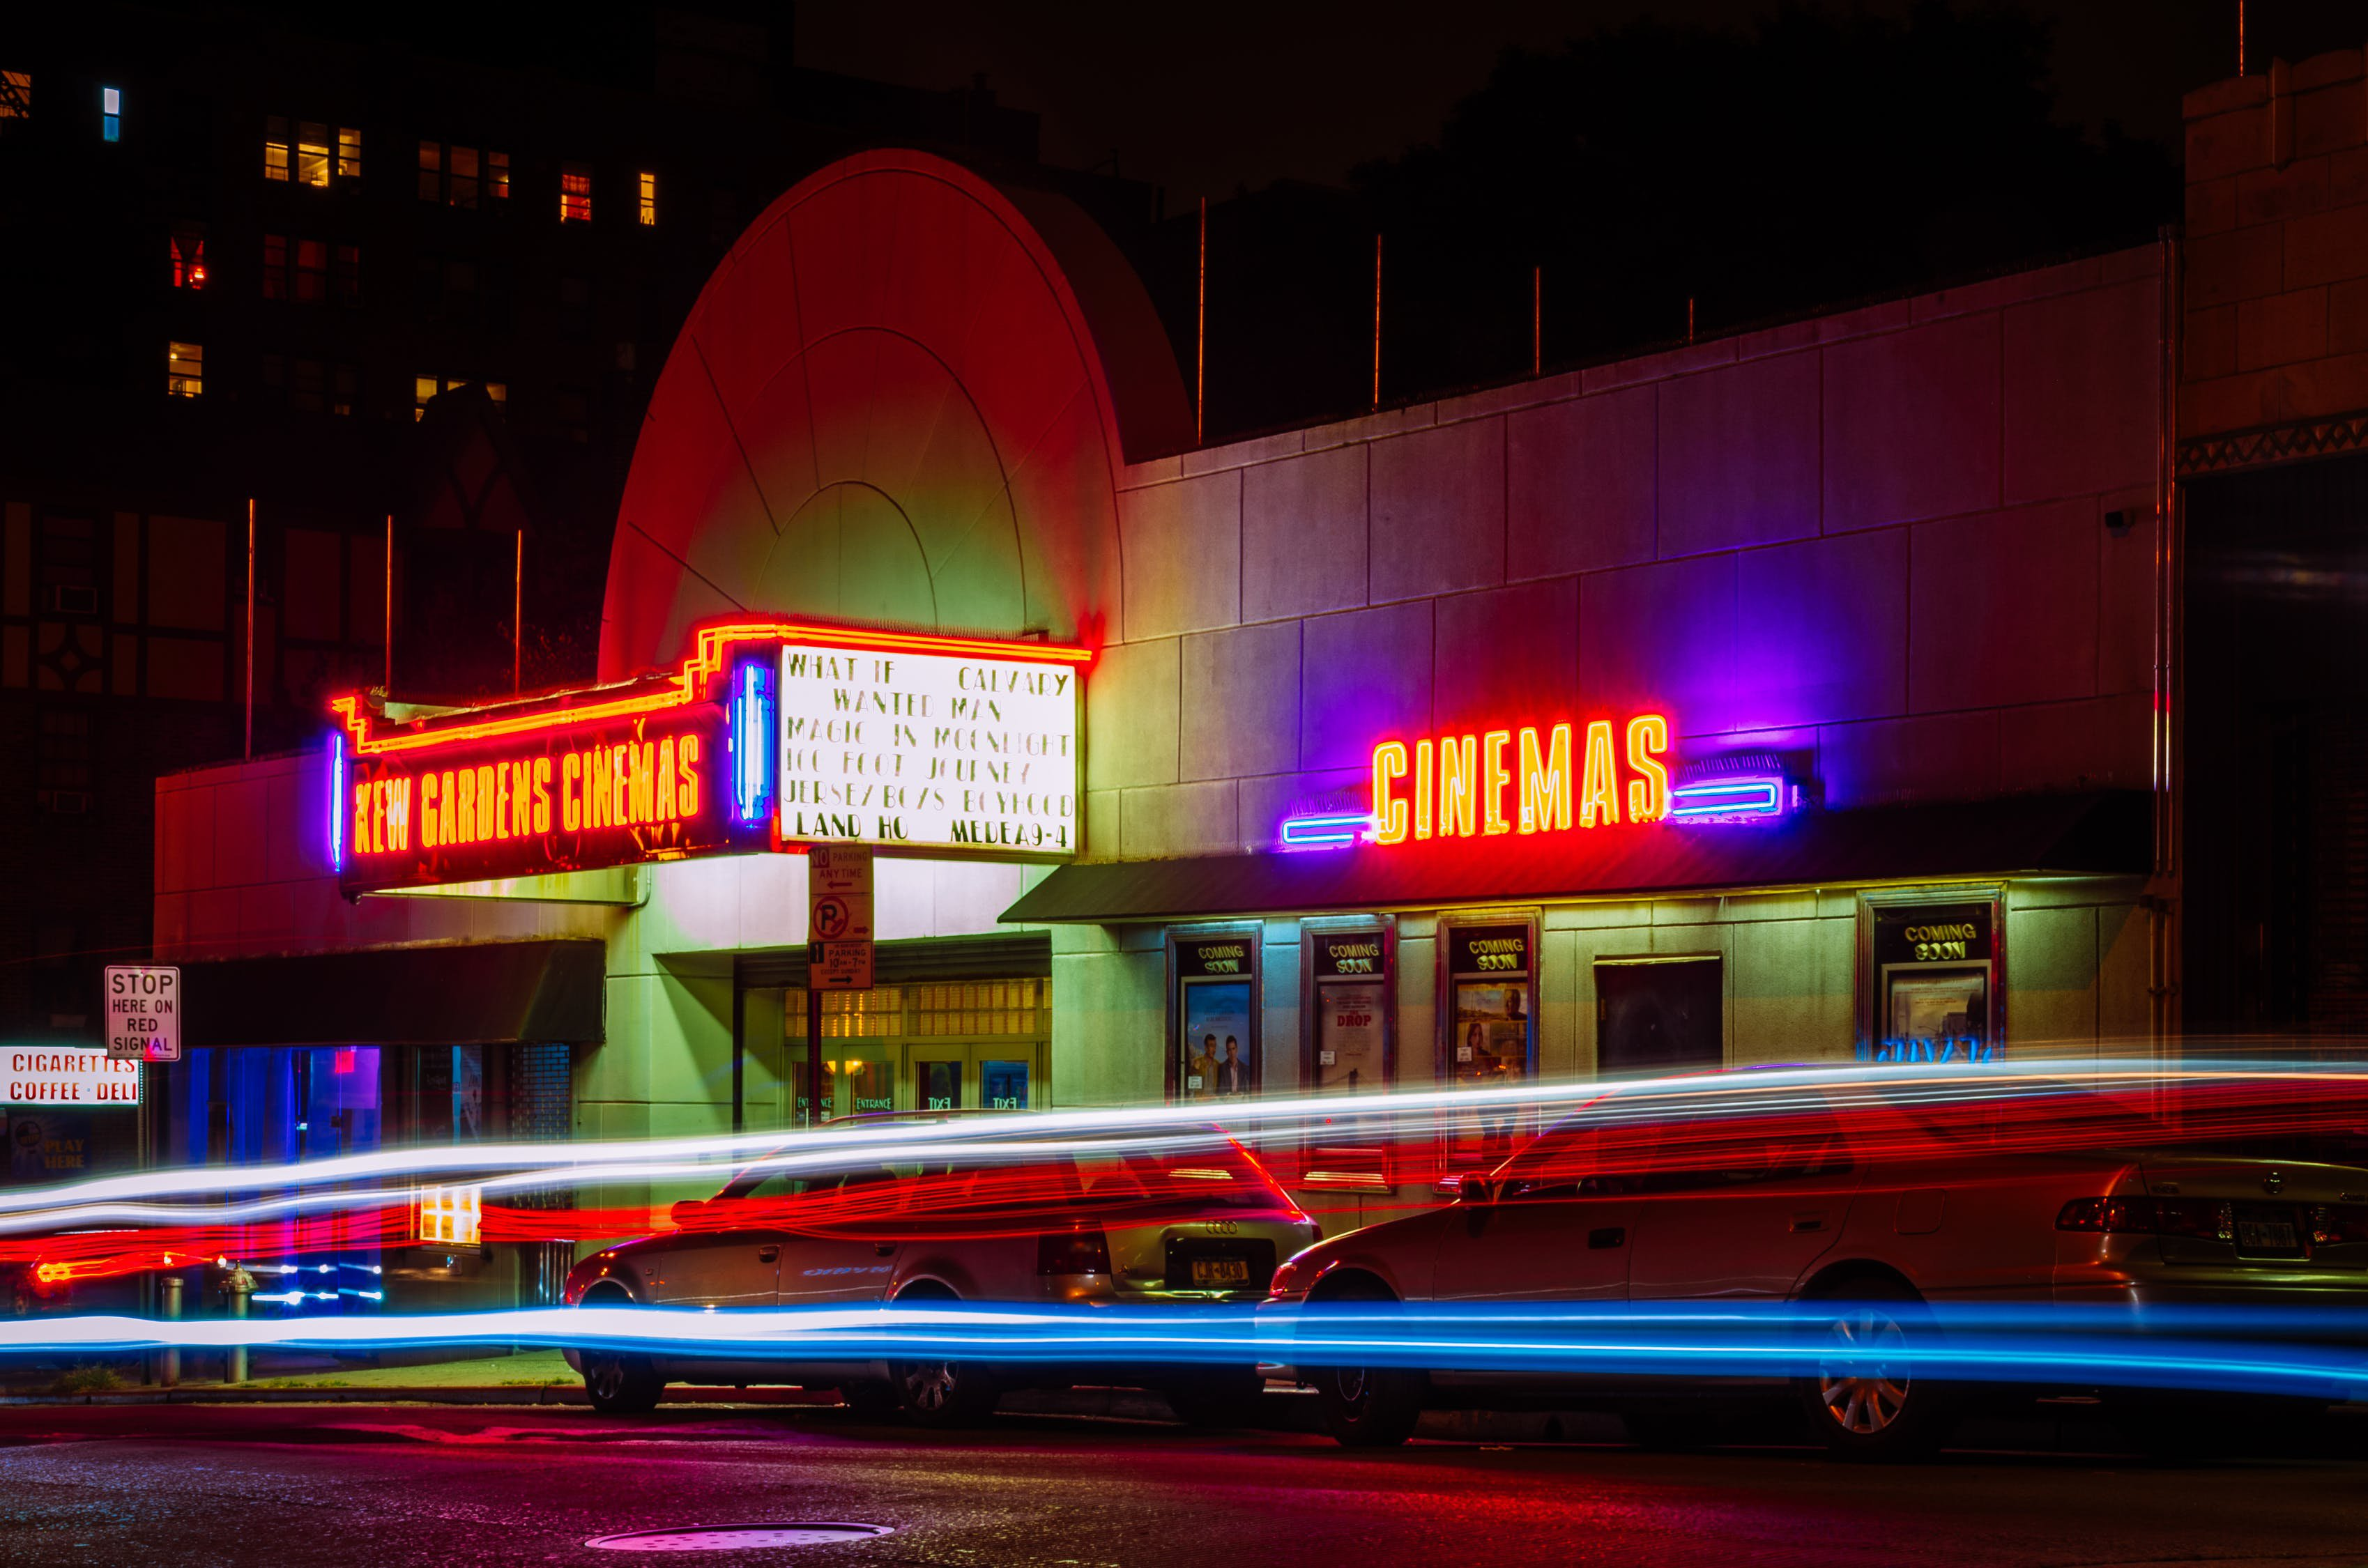 movie theater image.jpeg